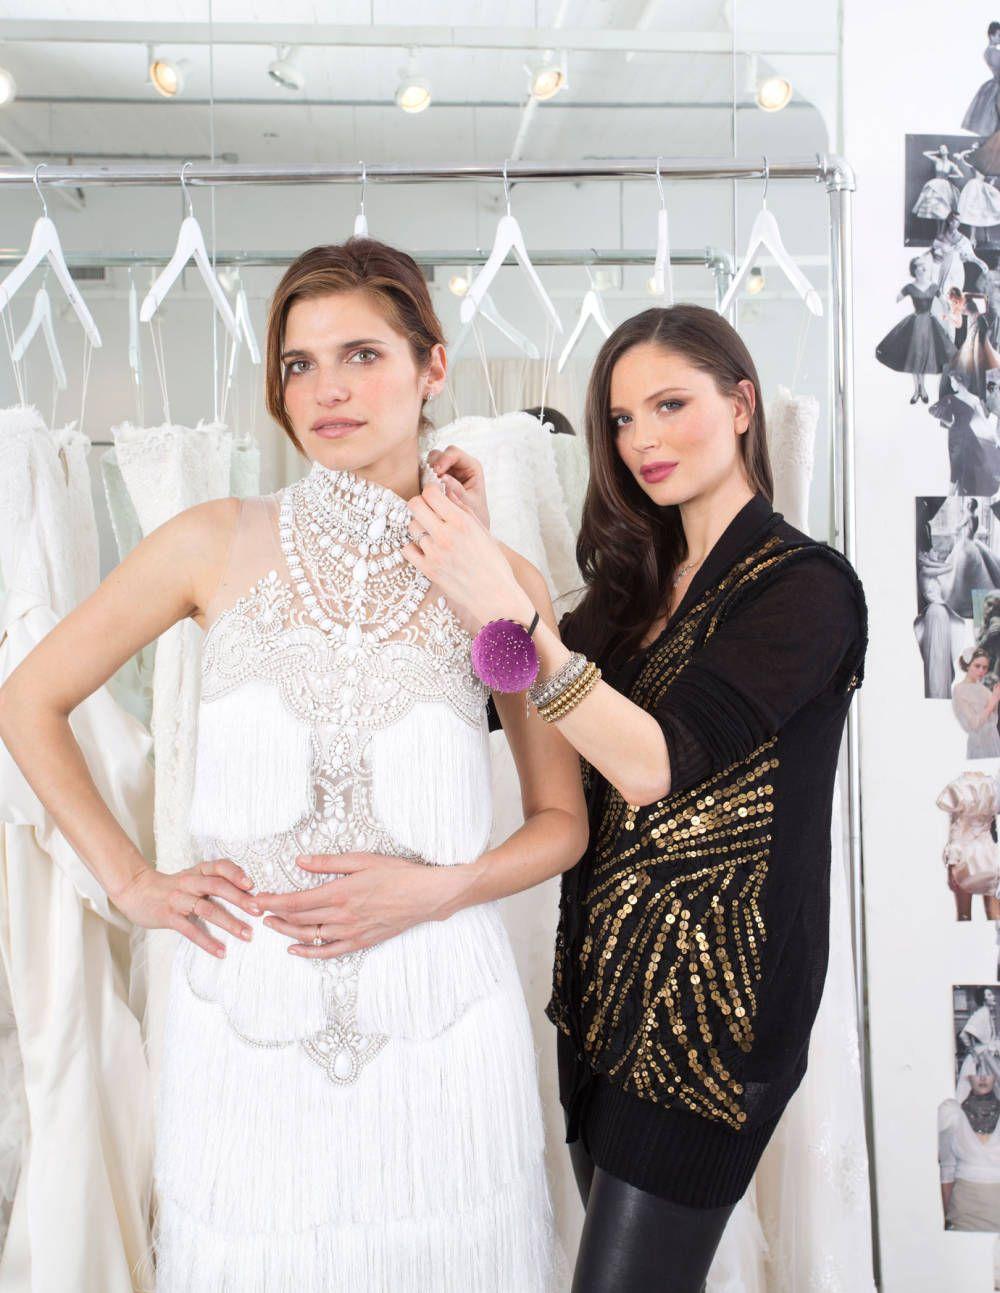 Easy Riders Celebrity wedding dresses, Wedding dresses